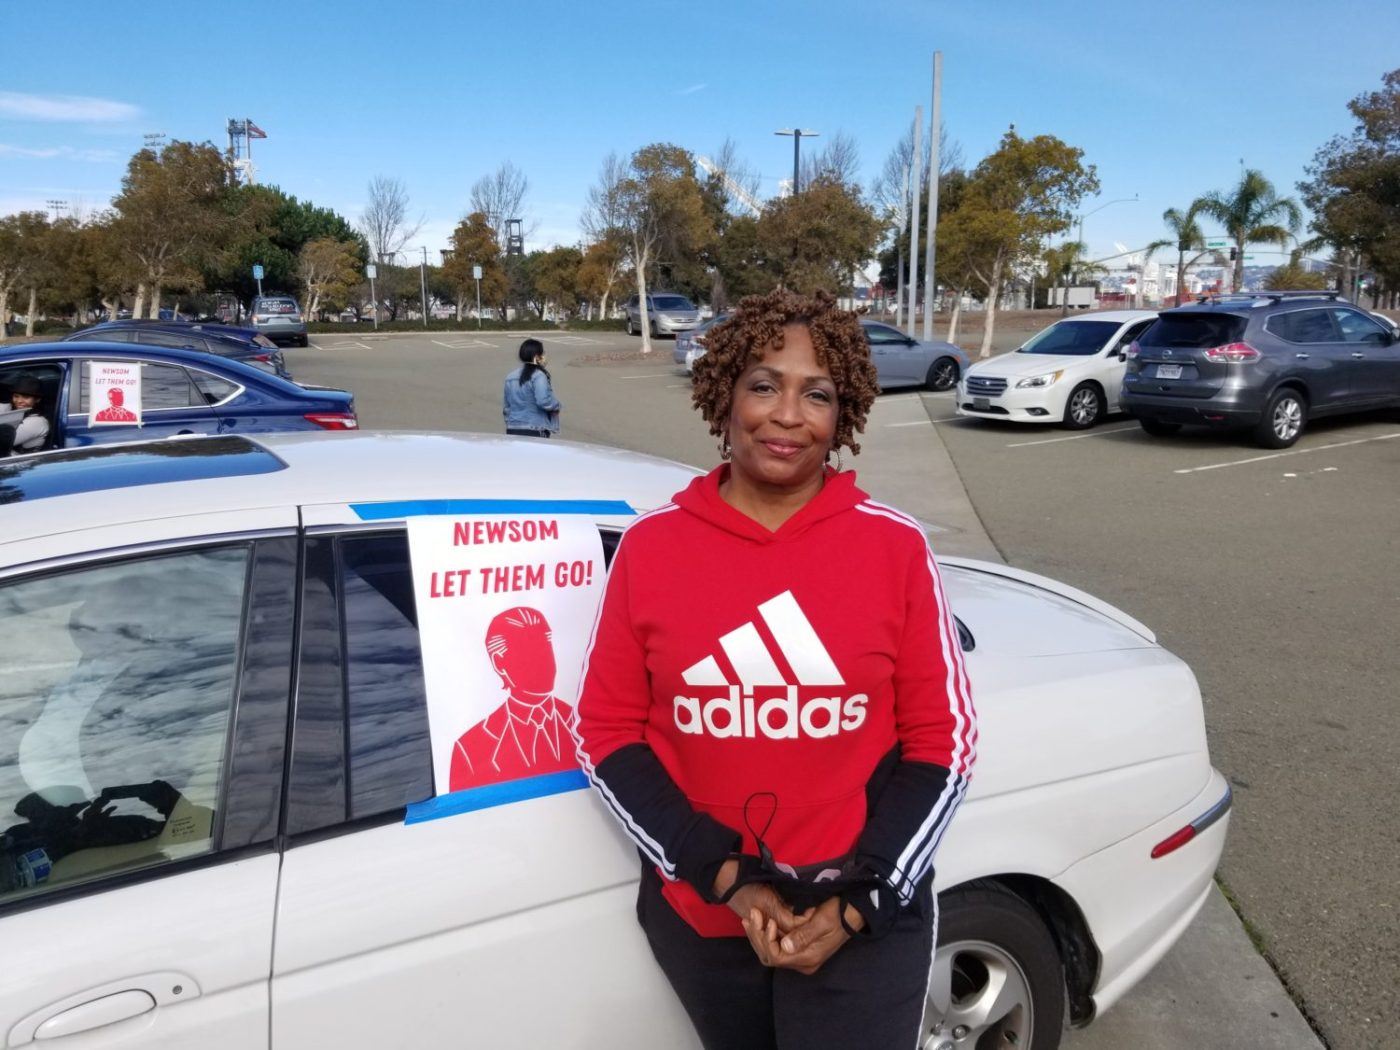 DeWayne-Ewings-wife-Sharon-Chatoo-Ewing-joined-car-caravan-demanding-Newsom-free-prisoners-013121-1400x1050, The found condom: A DeWayne Ewing mystery, Behind Enemy Lines